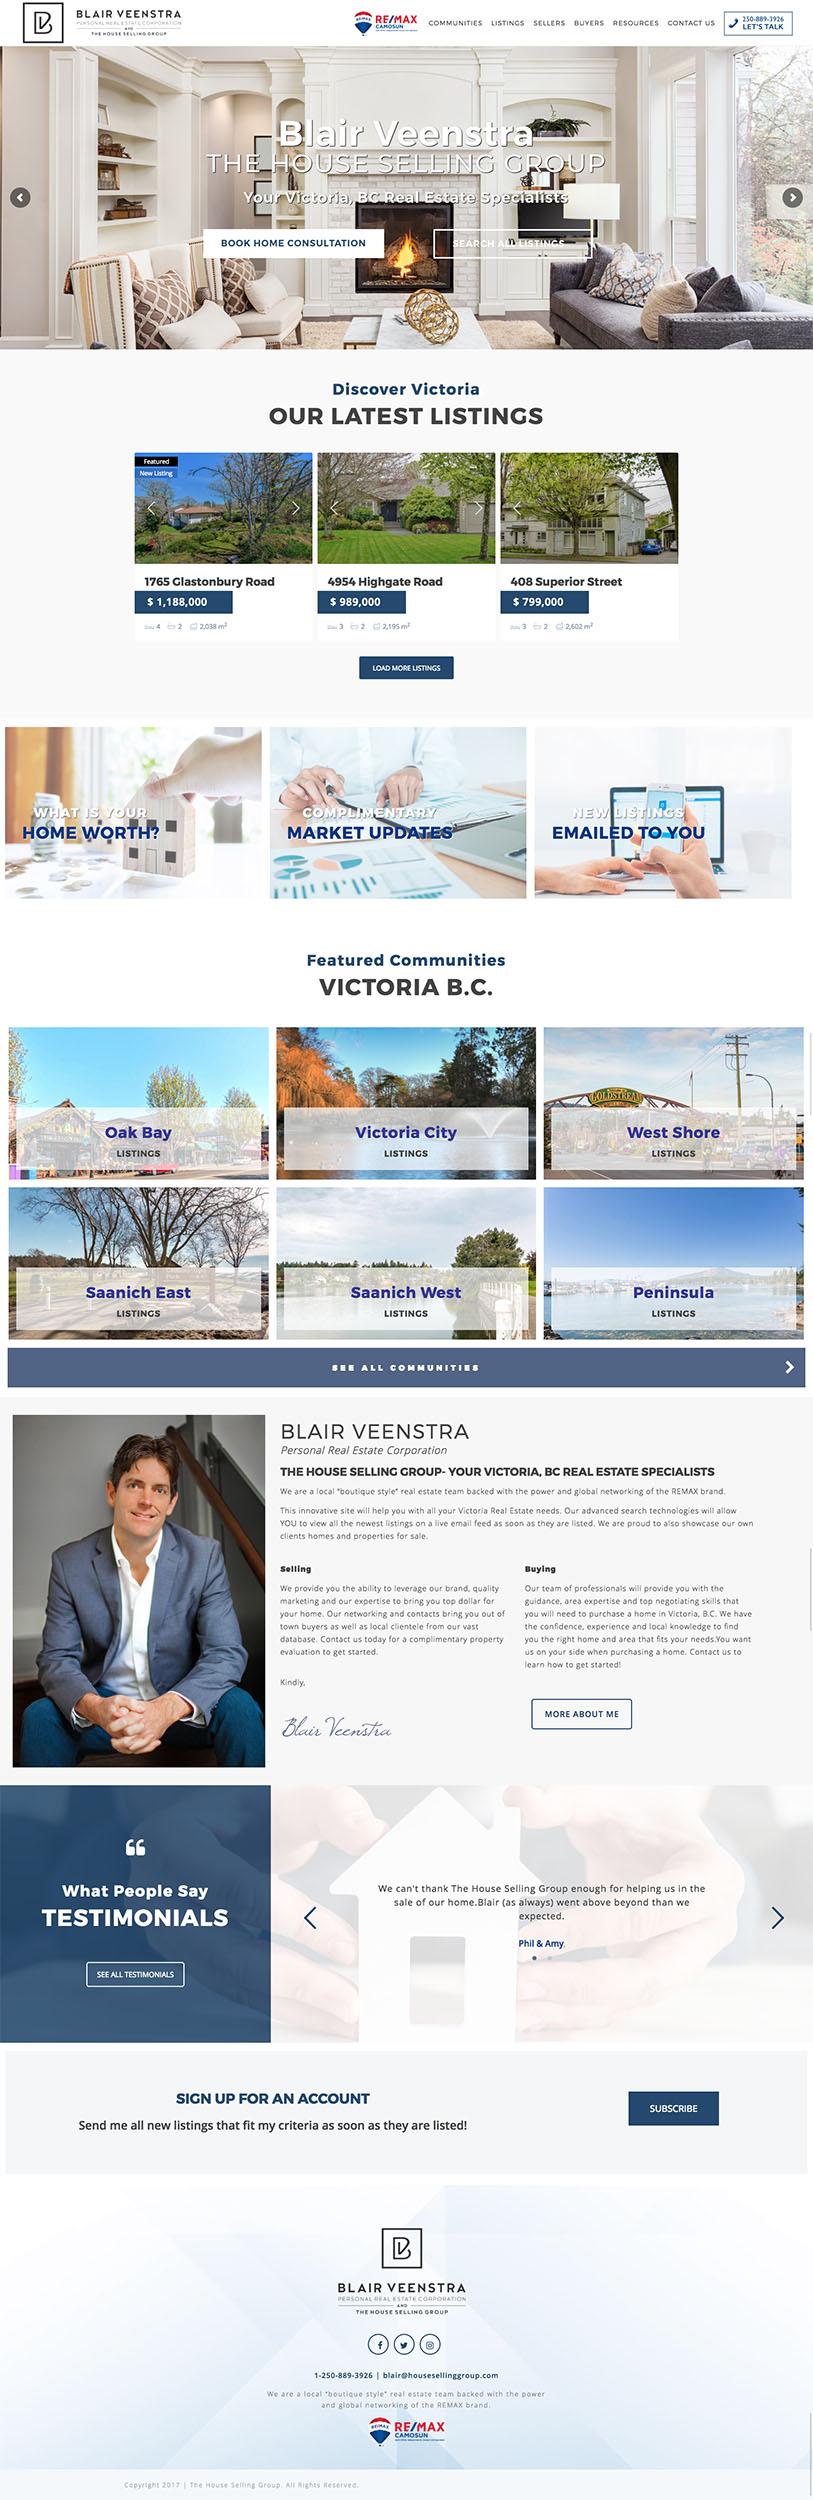 Blair Veenstra Wordpress web stránka